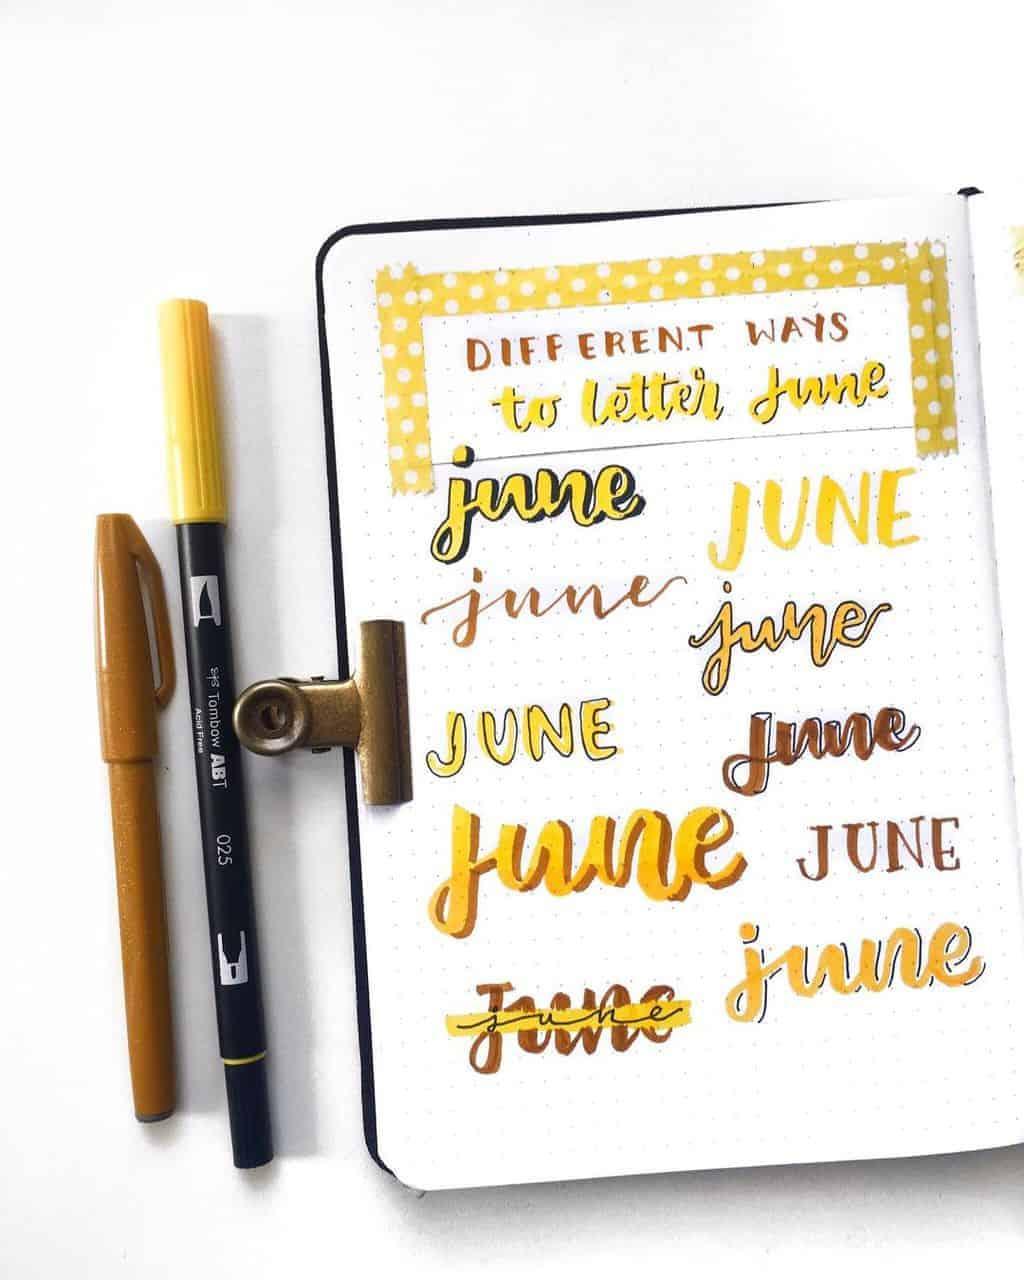 Bullet Journal Headers, ideas by @cozydaydreams | Masha Plans